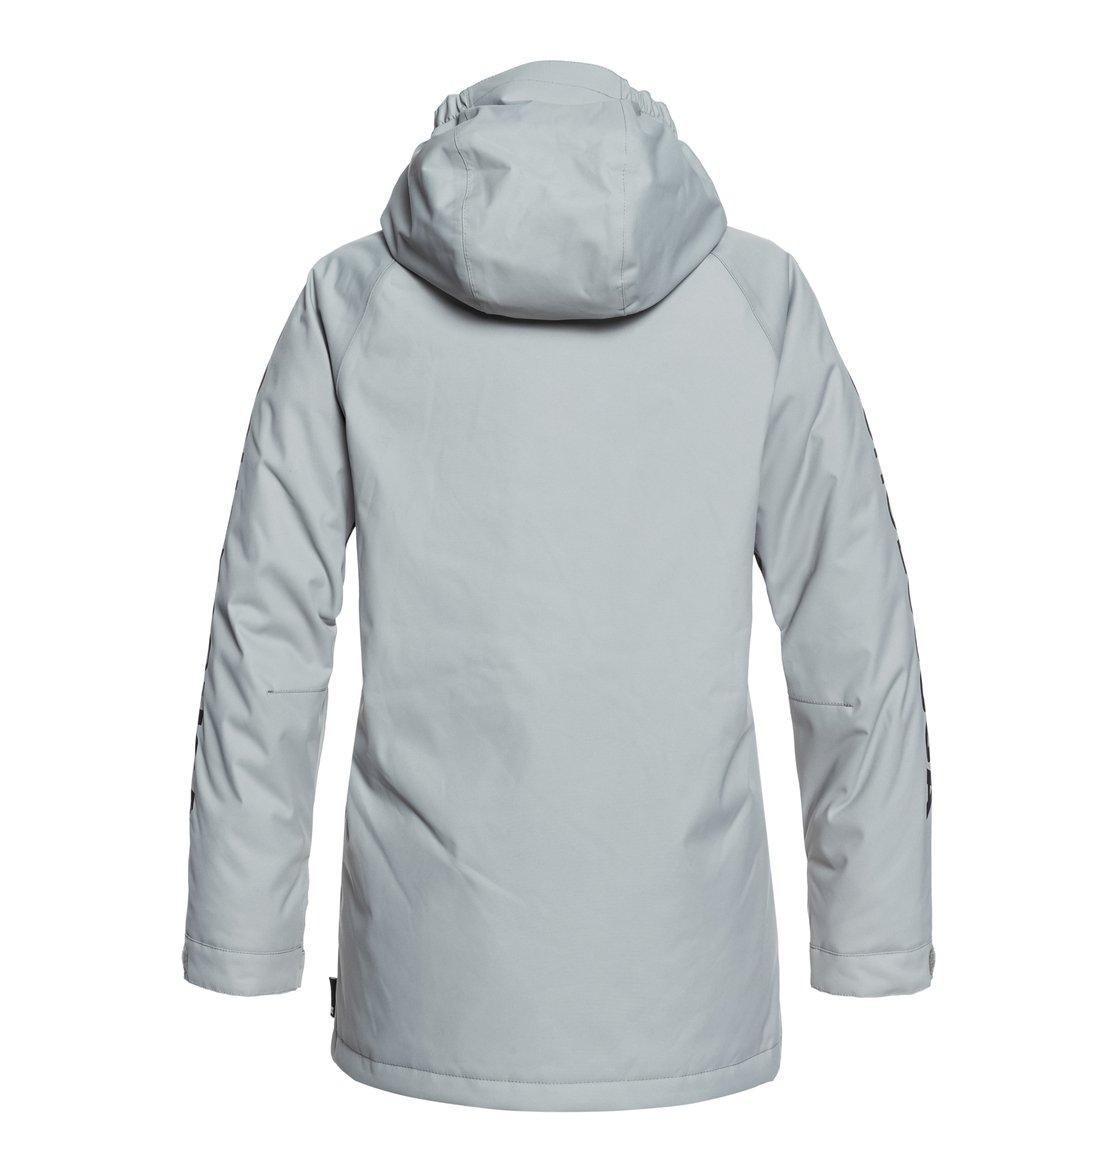 6770e2c9580a DC Shoes™ Ripley - Snow Jacket for Boys 8-16 EDBTJ03024